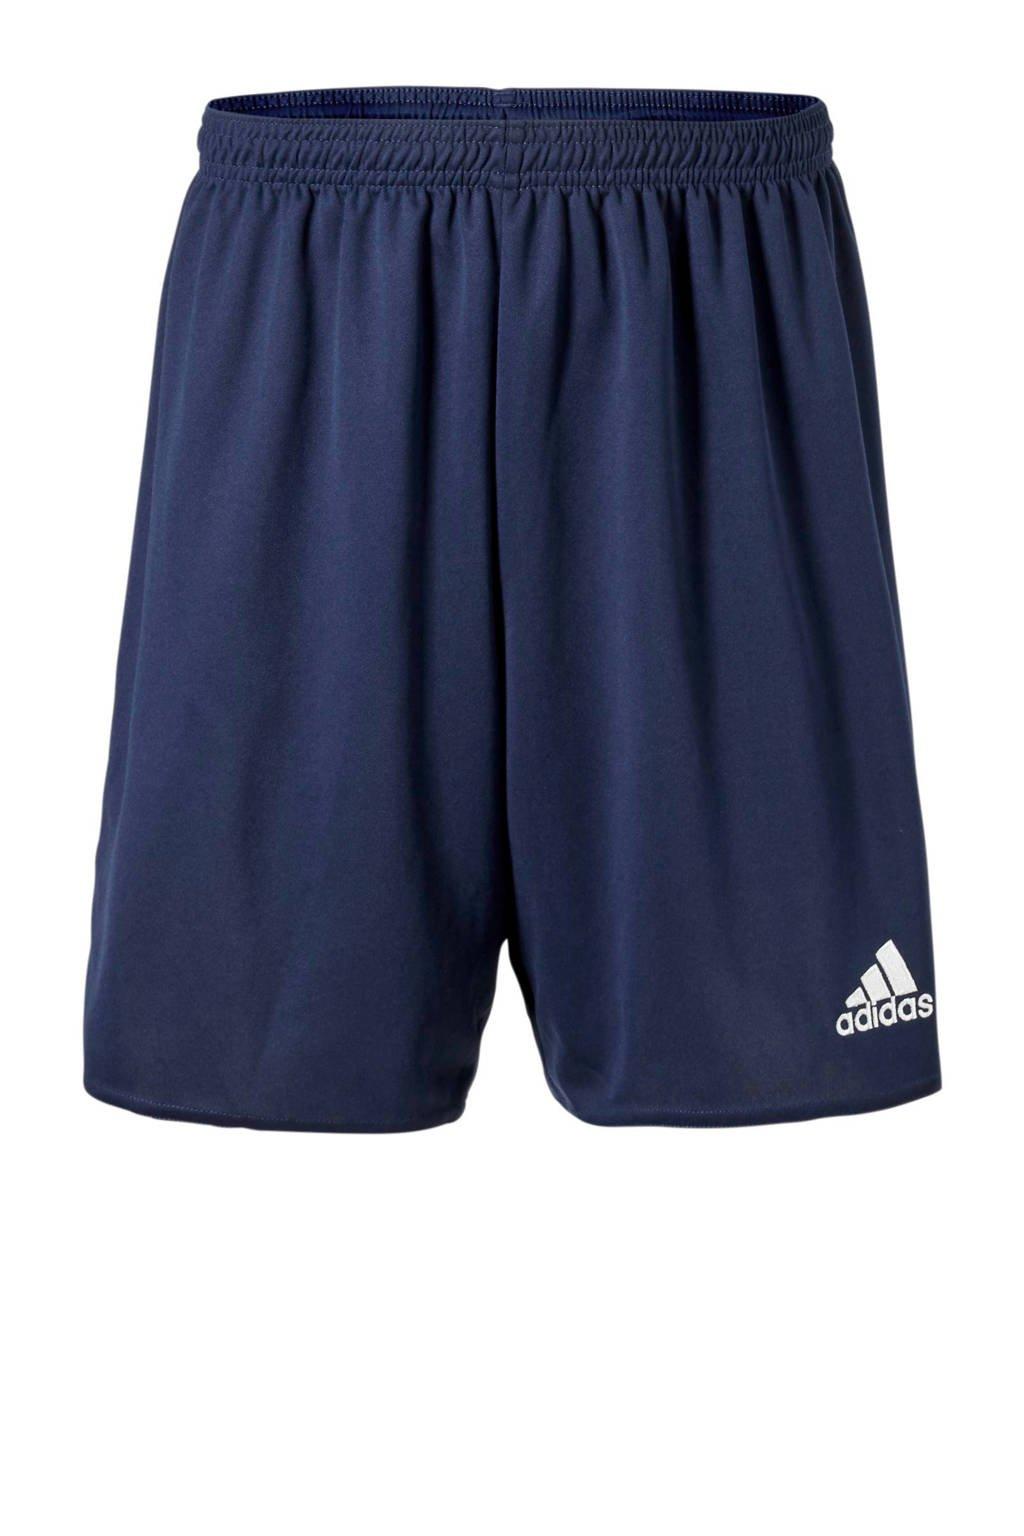 adidas Performance   sportshort Parma donkerblauw, Donkerblauw